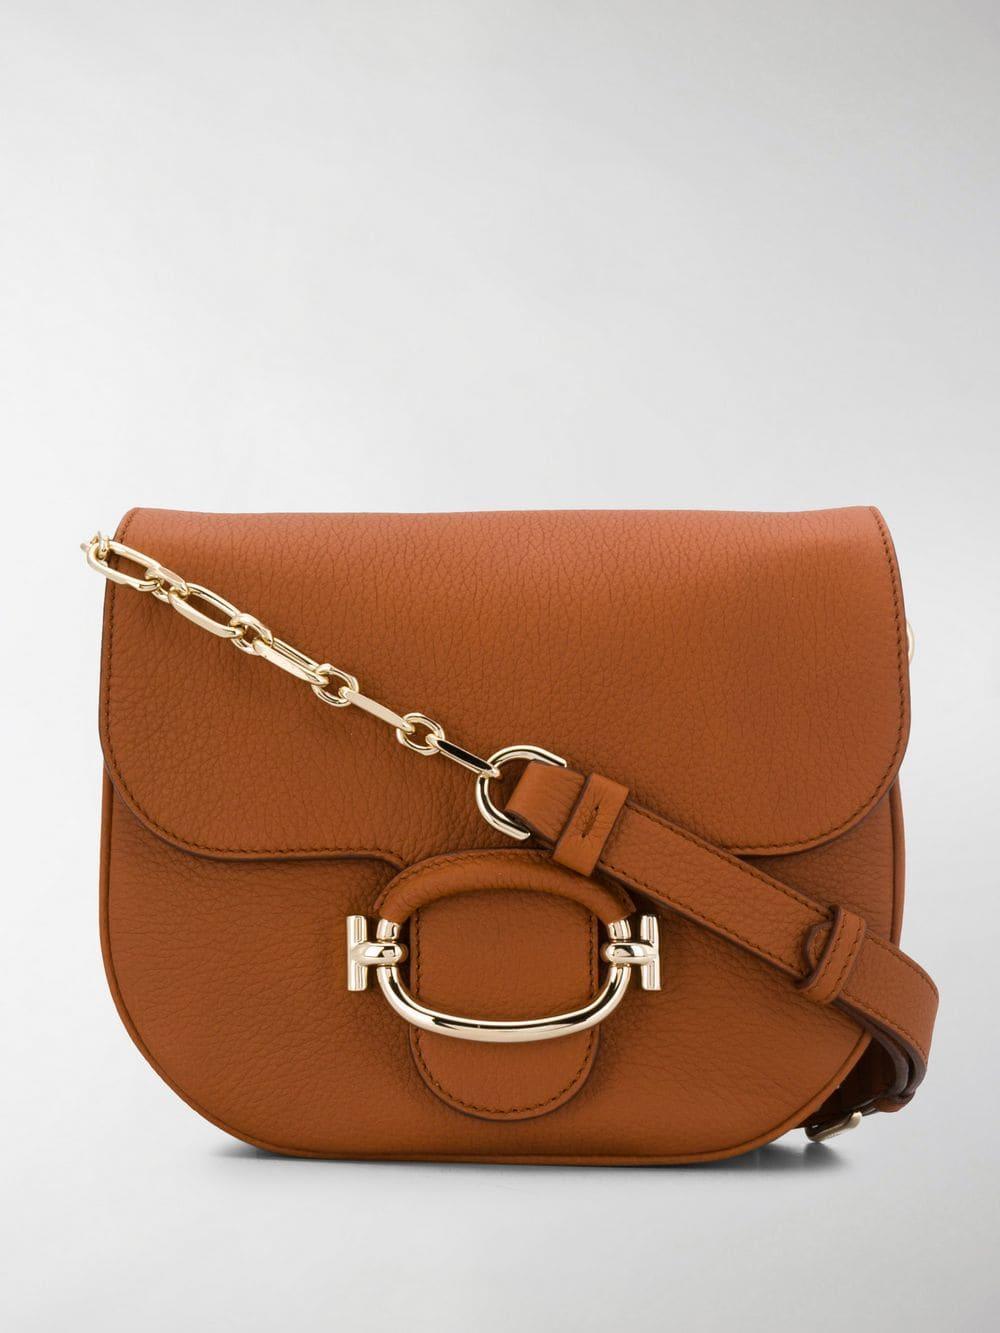 4c24fec363 Lyst - Tod's Medium Crossbody Bag in Brown